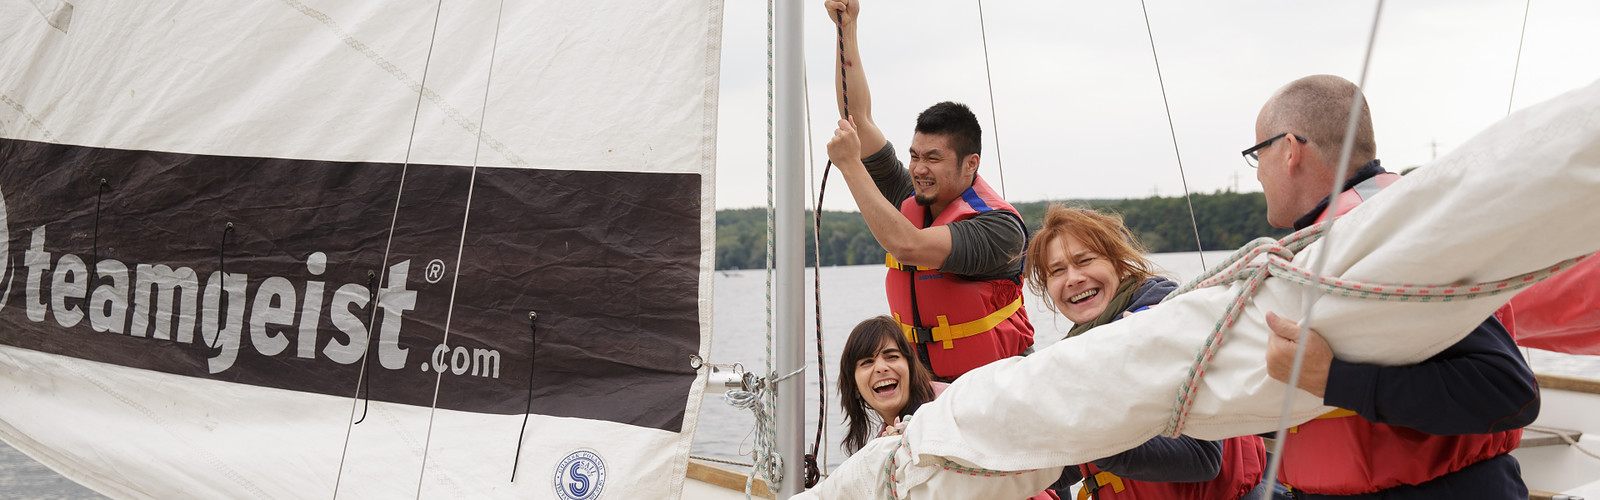 Sailing Event @ Teamgeist GmbH